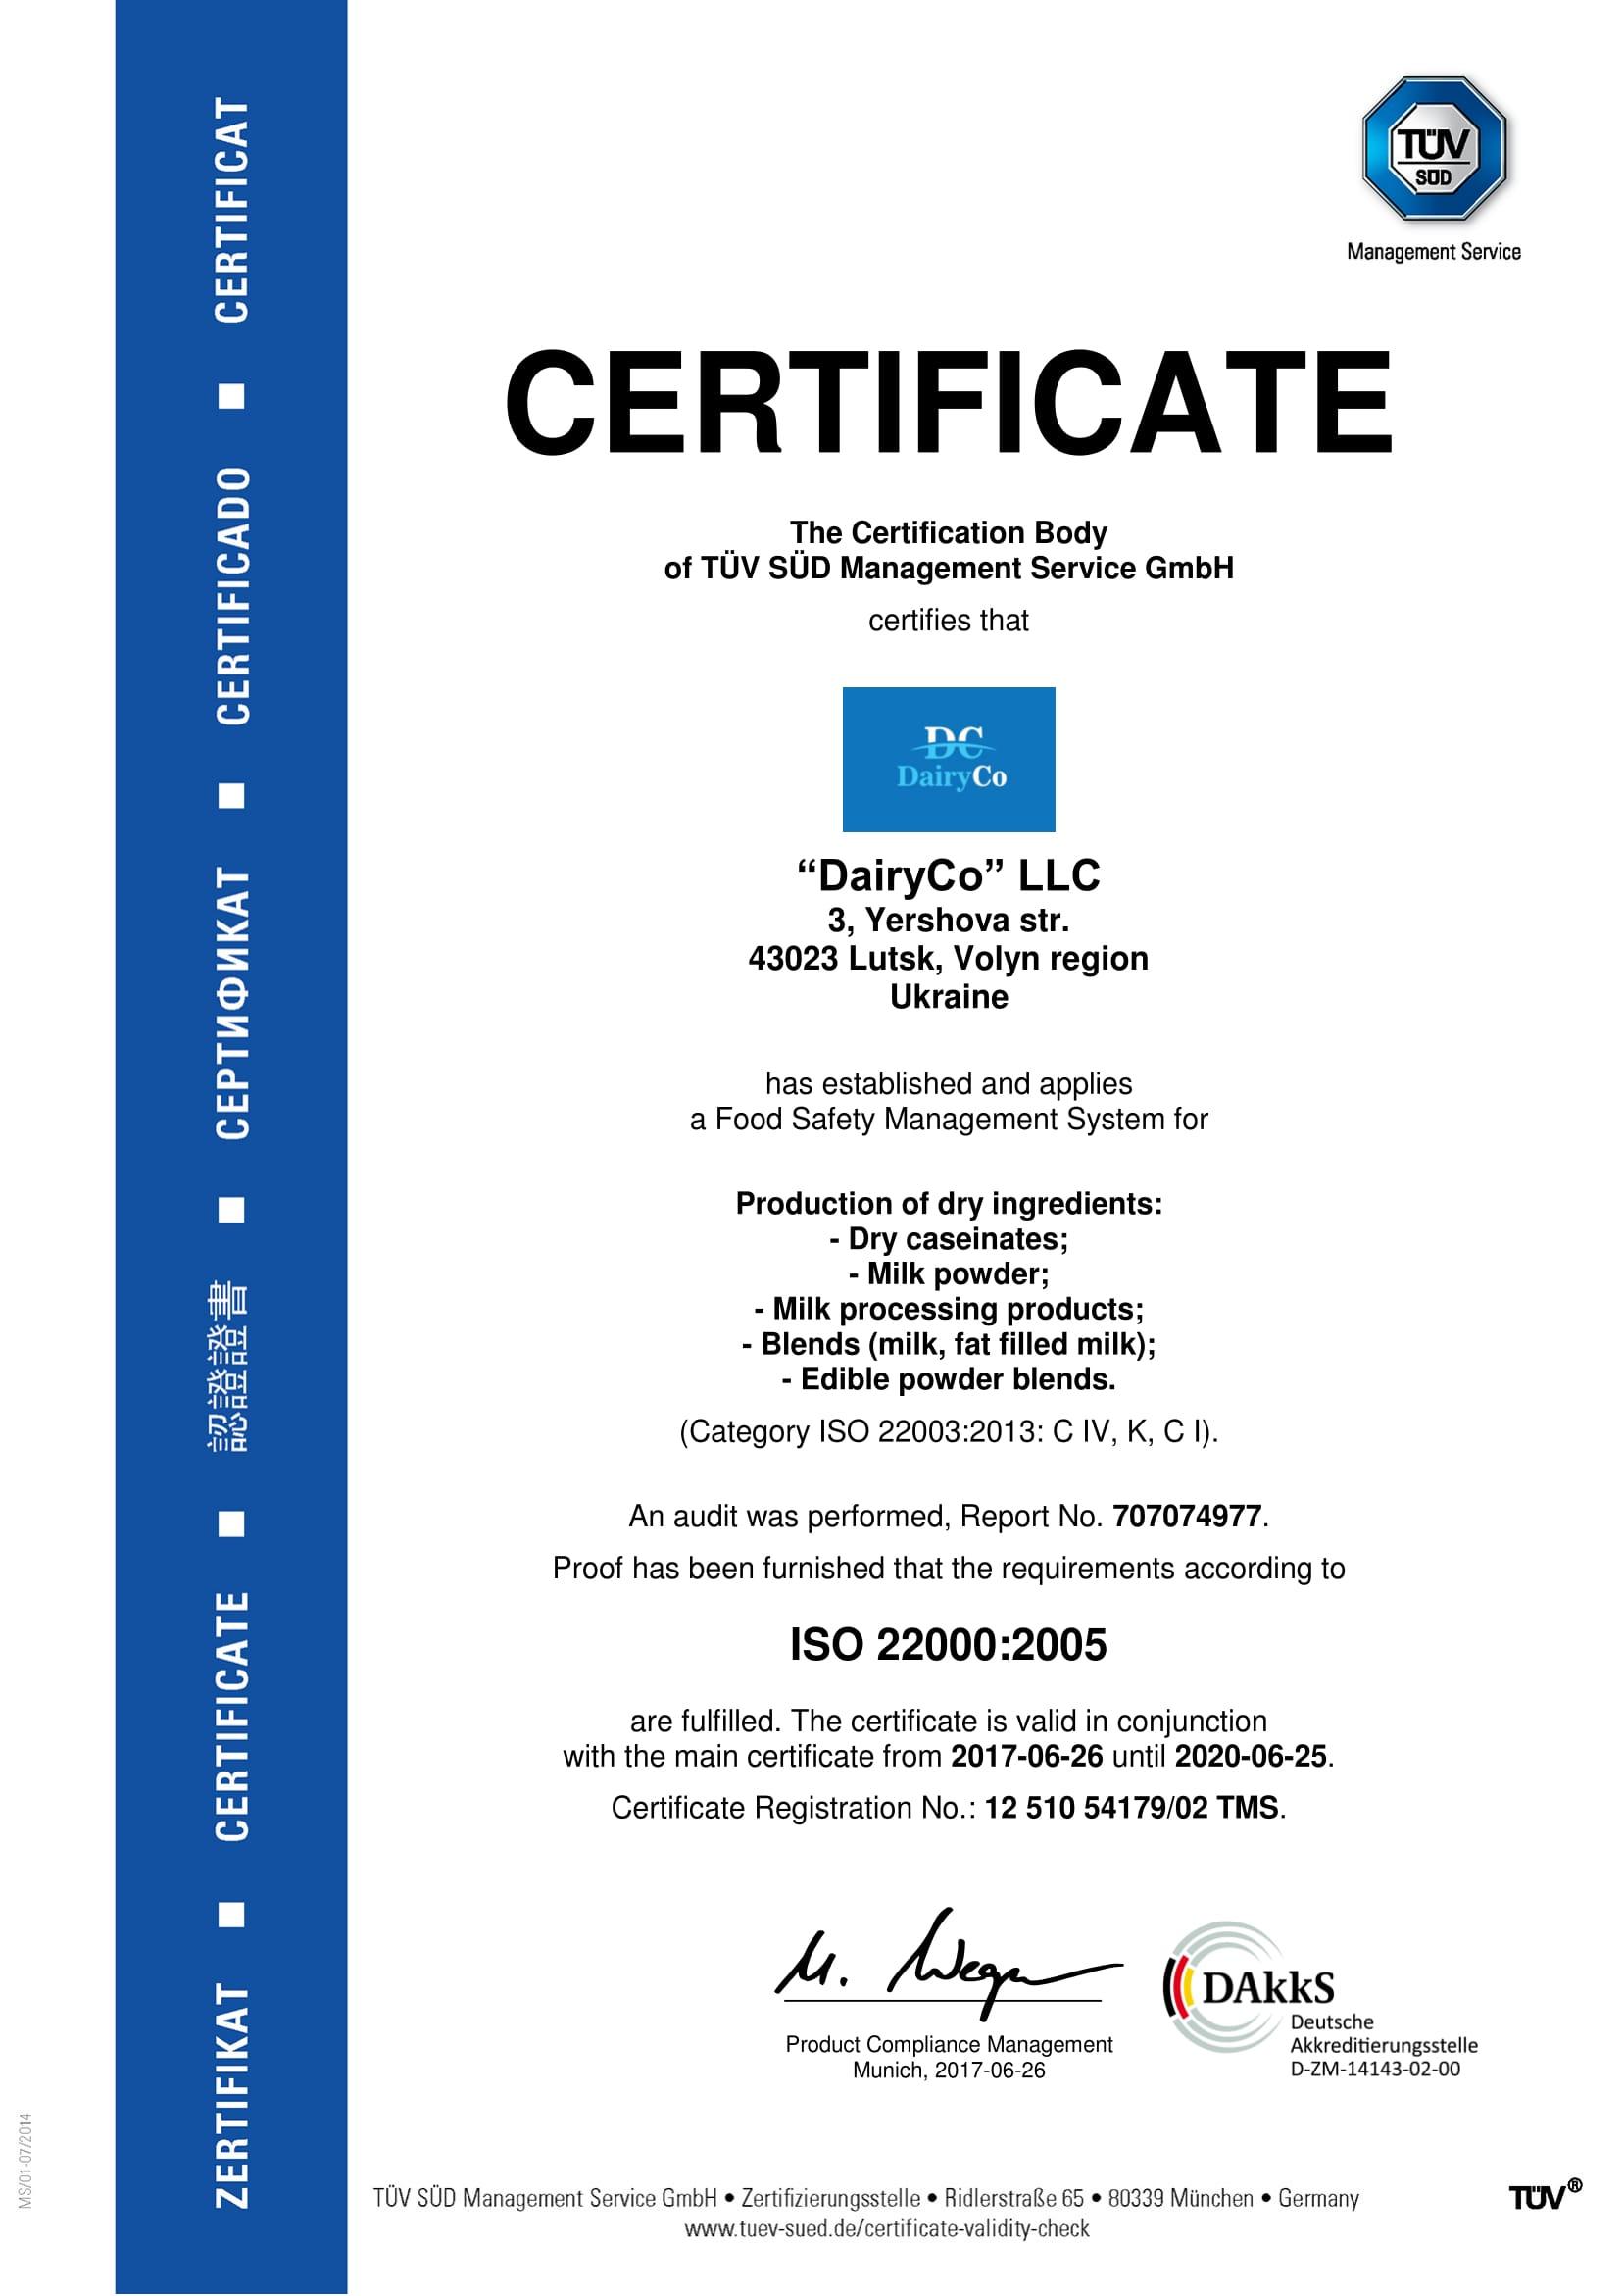 DairyCo LLC